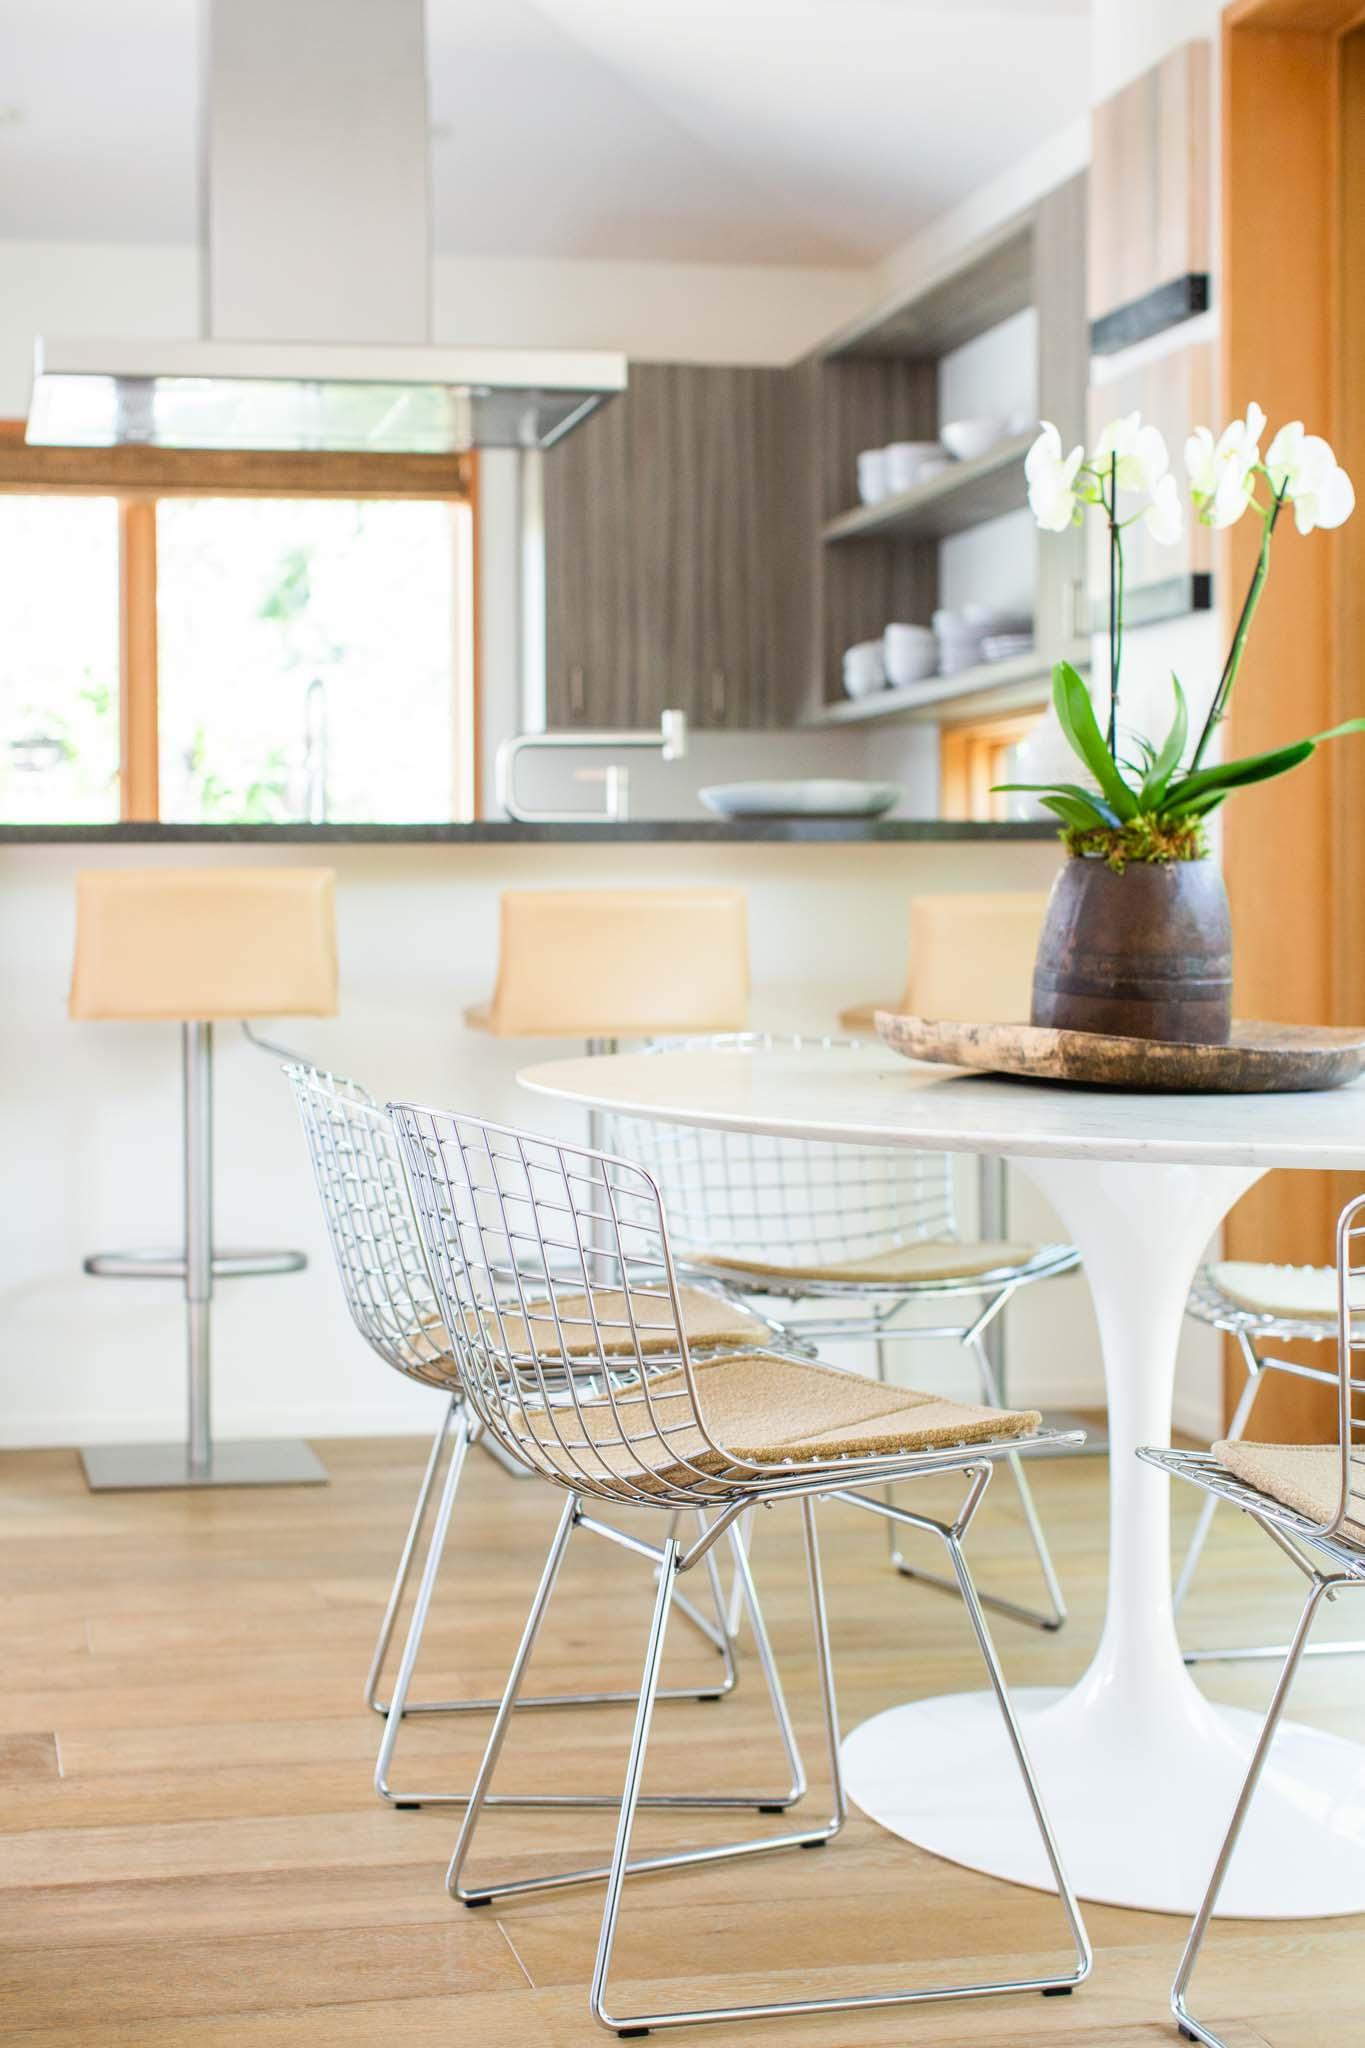 Jodi G Designs | Santa Barbara Interior Design Lanscape -4.jpg